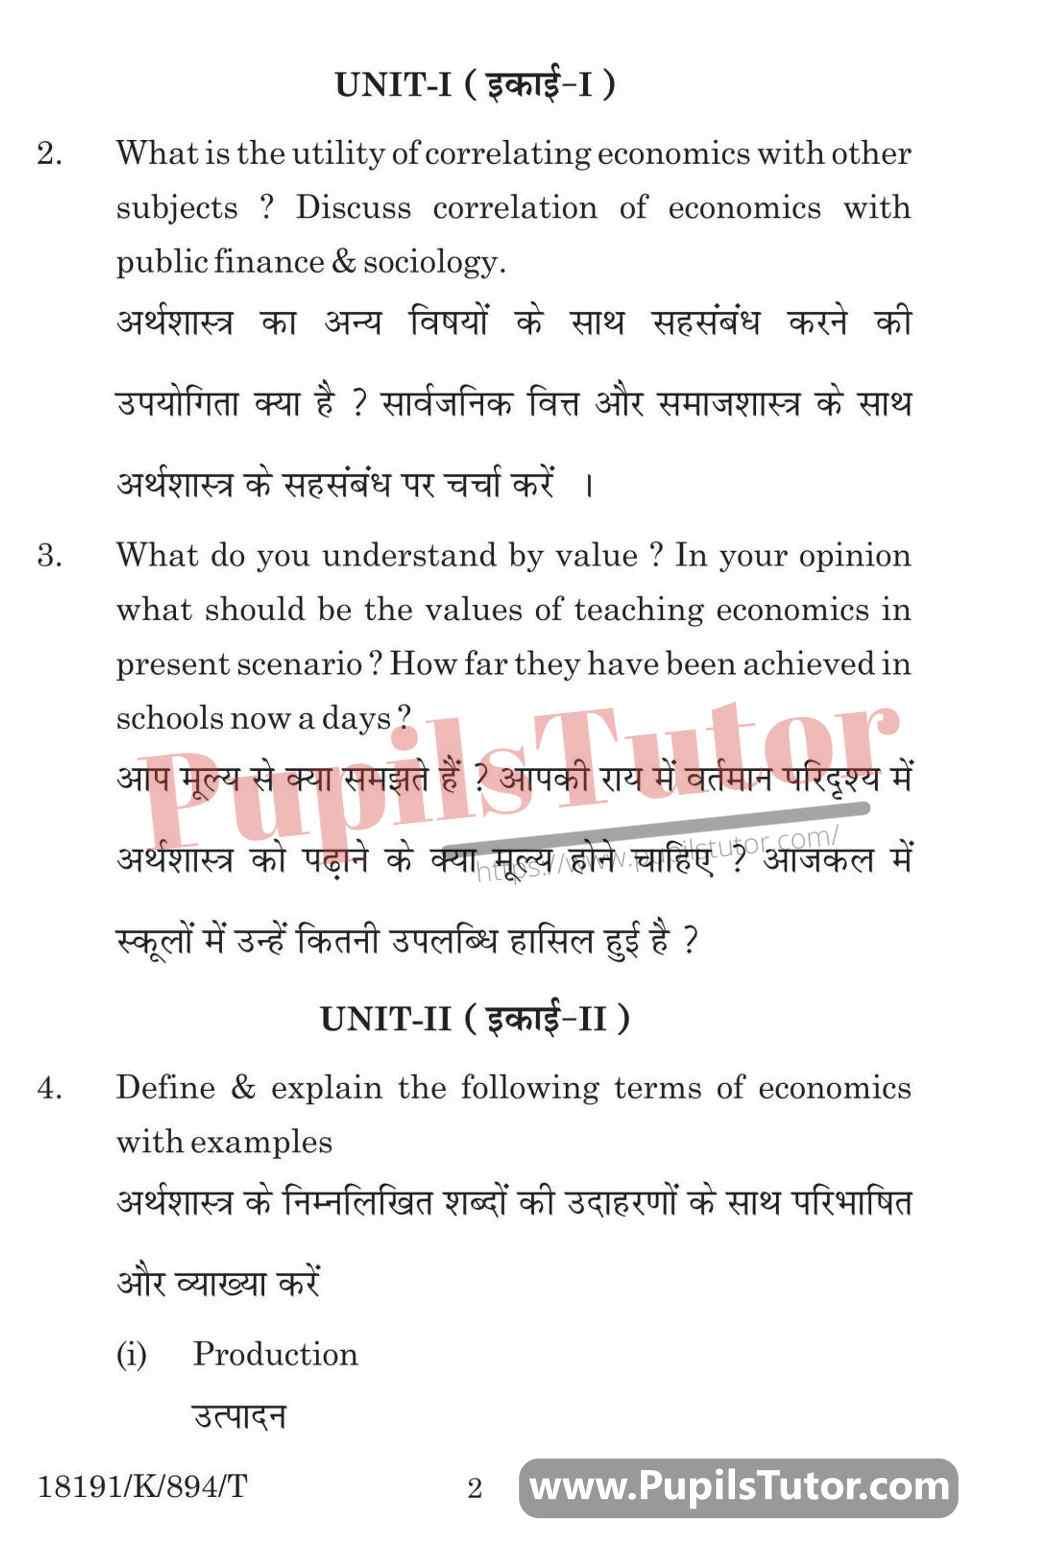 KUK (Kurukshetra University, Haryana) Pedagogy Of Economics Question Paper 2020 For B.Ed 1st And 2nd Year And All The 4 Semesters In English And Hindi Medium Free Download PDF - Page 2 - www.pupilstutor.com